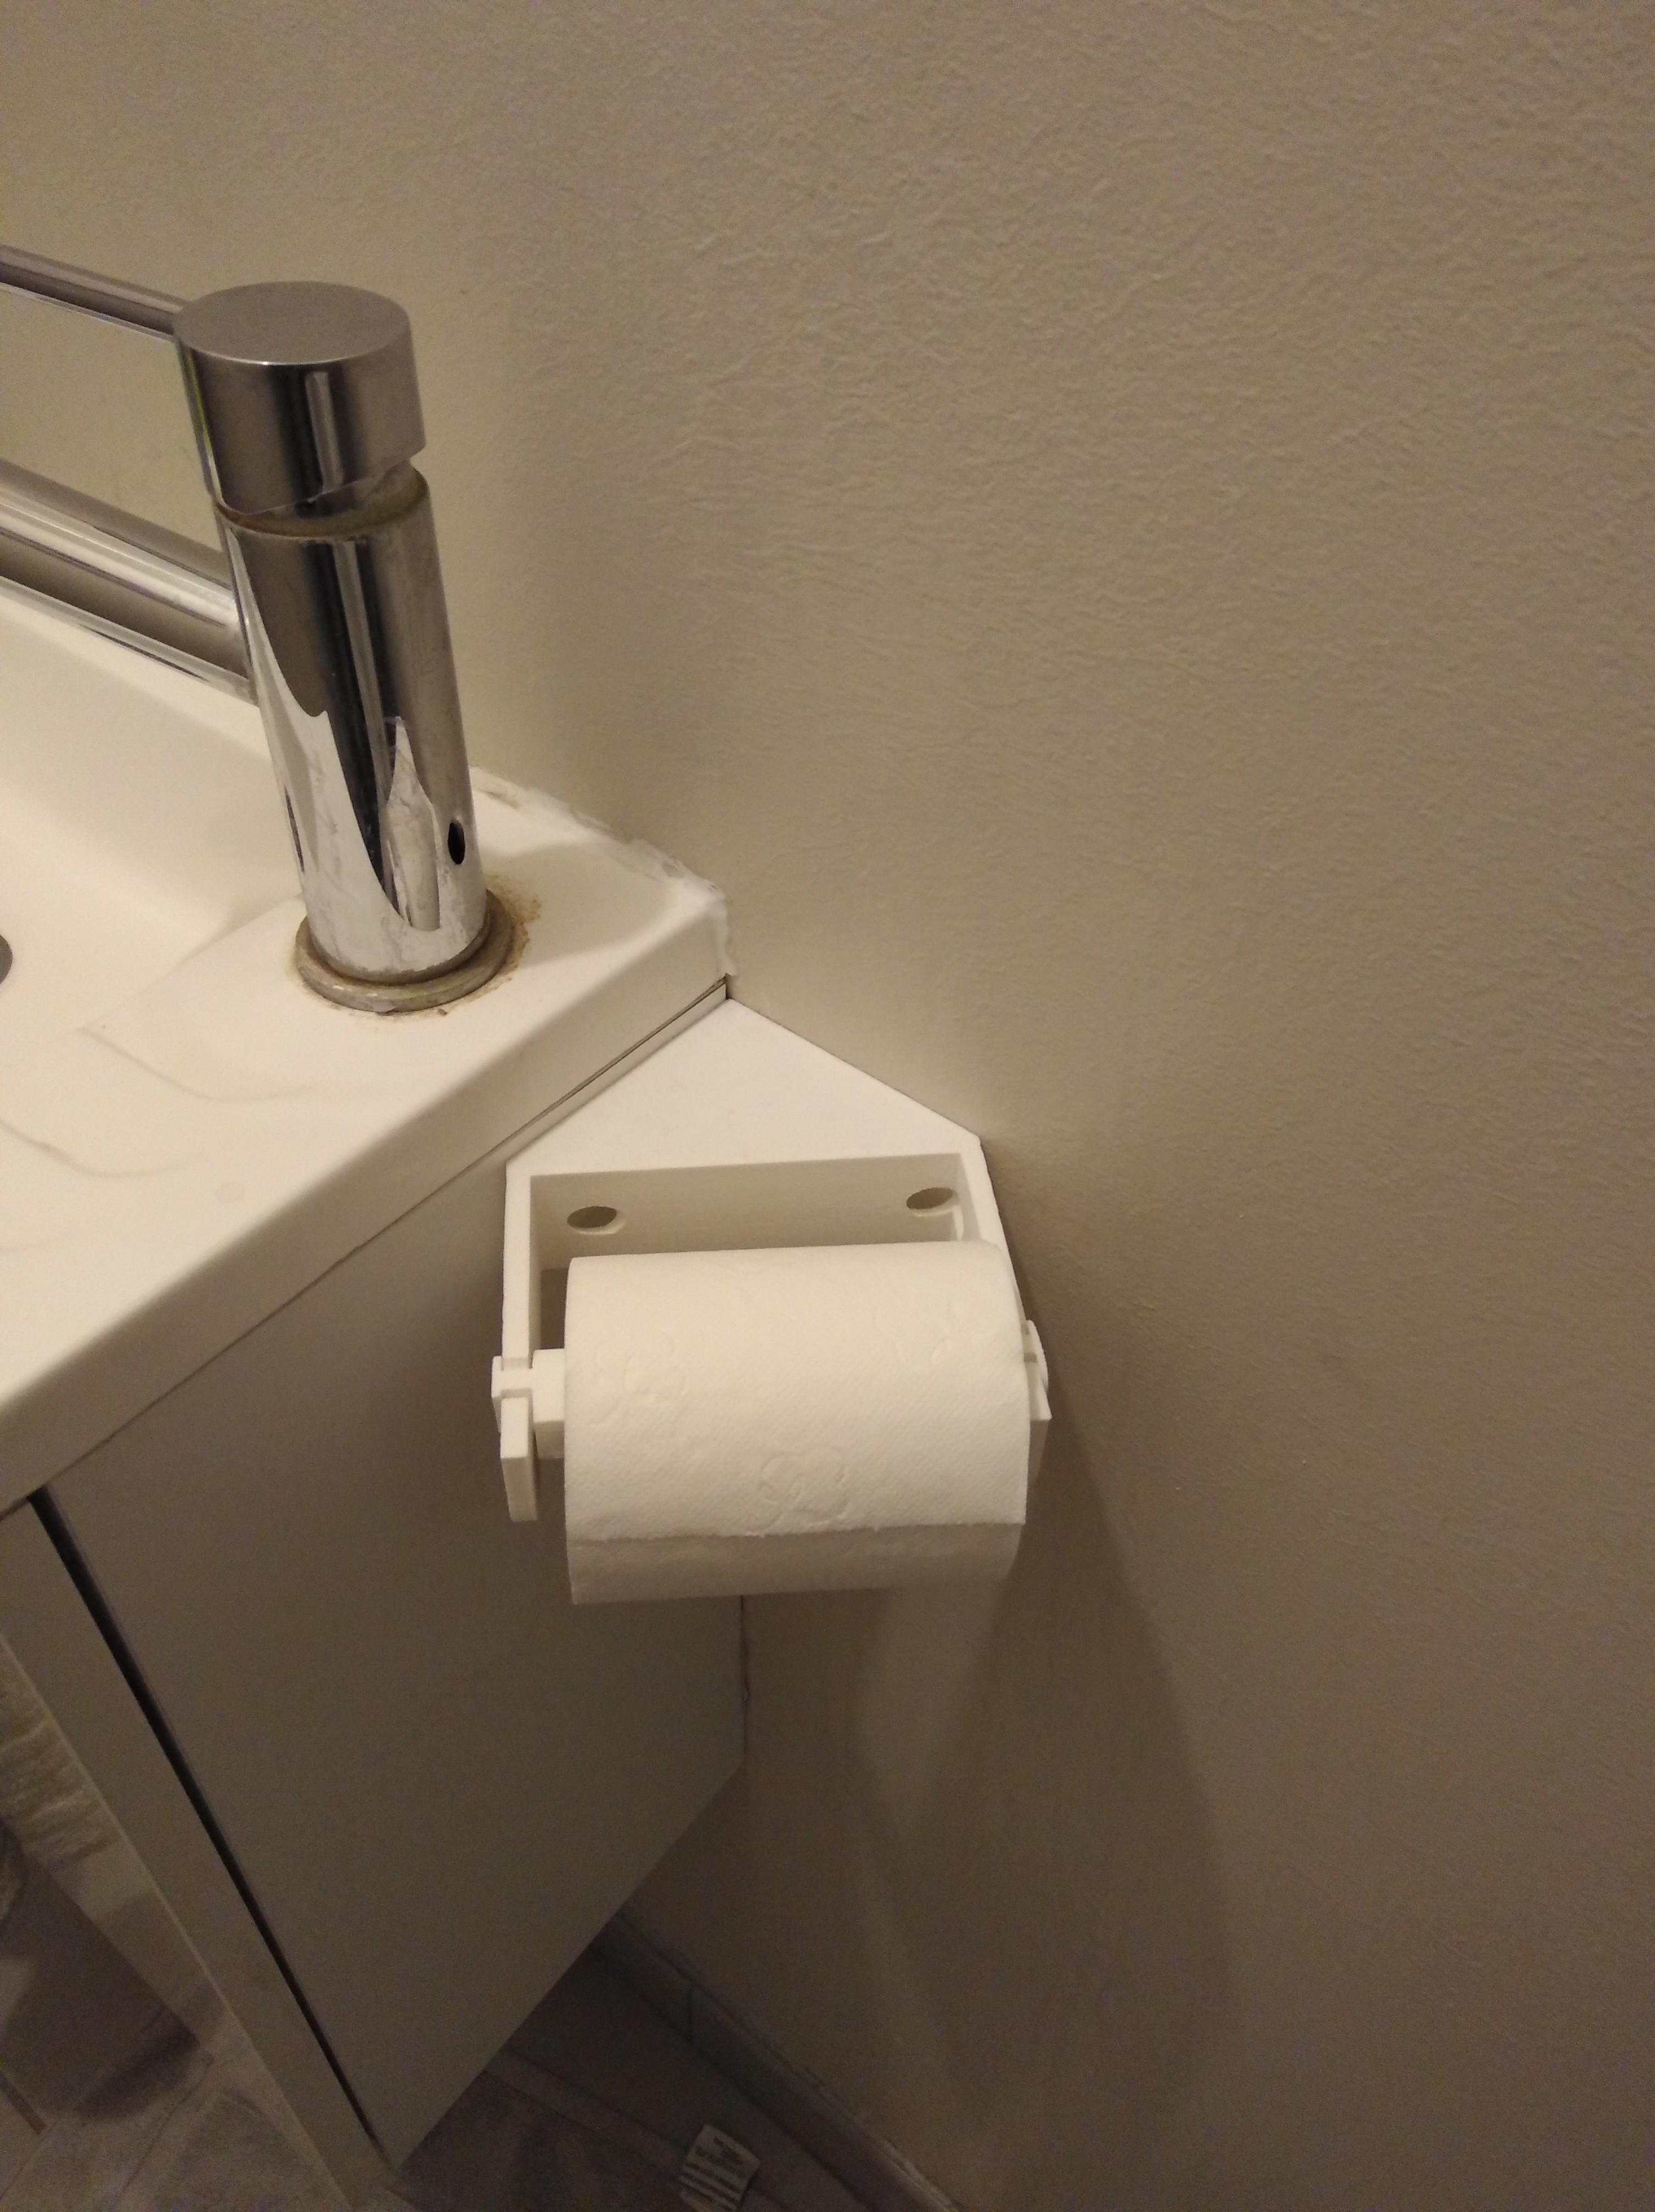 IMG_20180322_201546.jpg Download free STL file Corner toilet paper holder • Model to 3D print, LLH